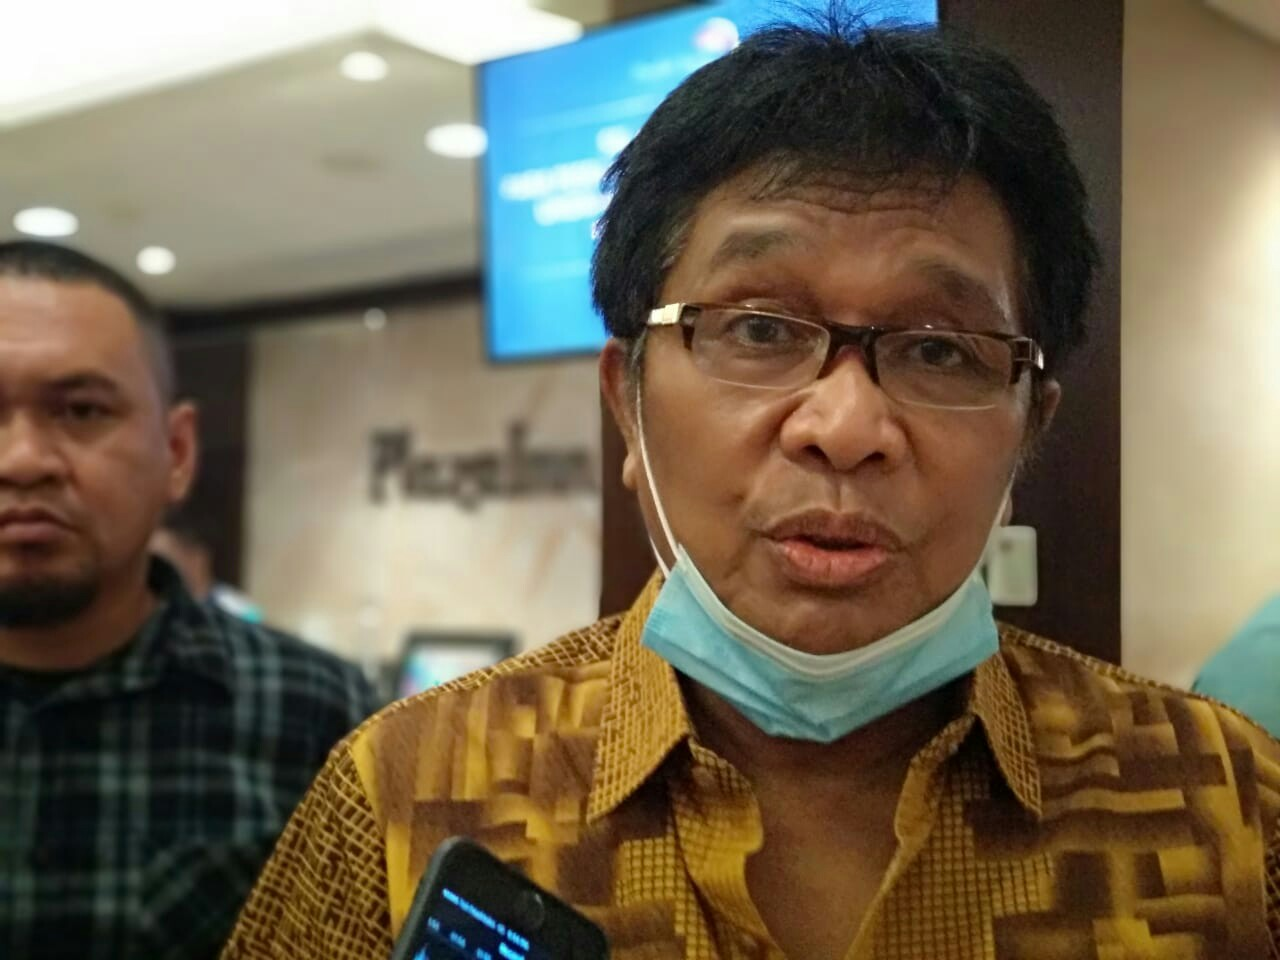 Ridwan Bae Sebut UU Jalan Mendesak Untuk Pembangunan Infrastruktur Indonesia Timur